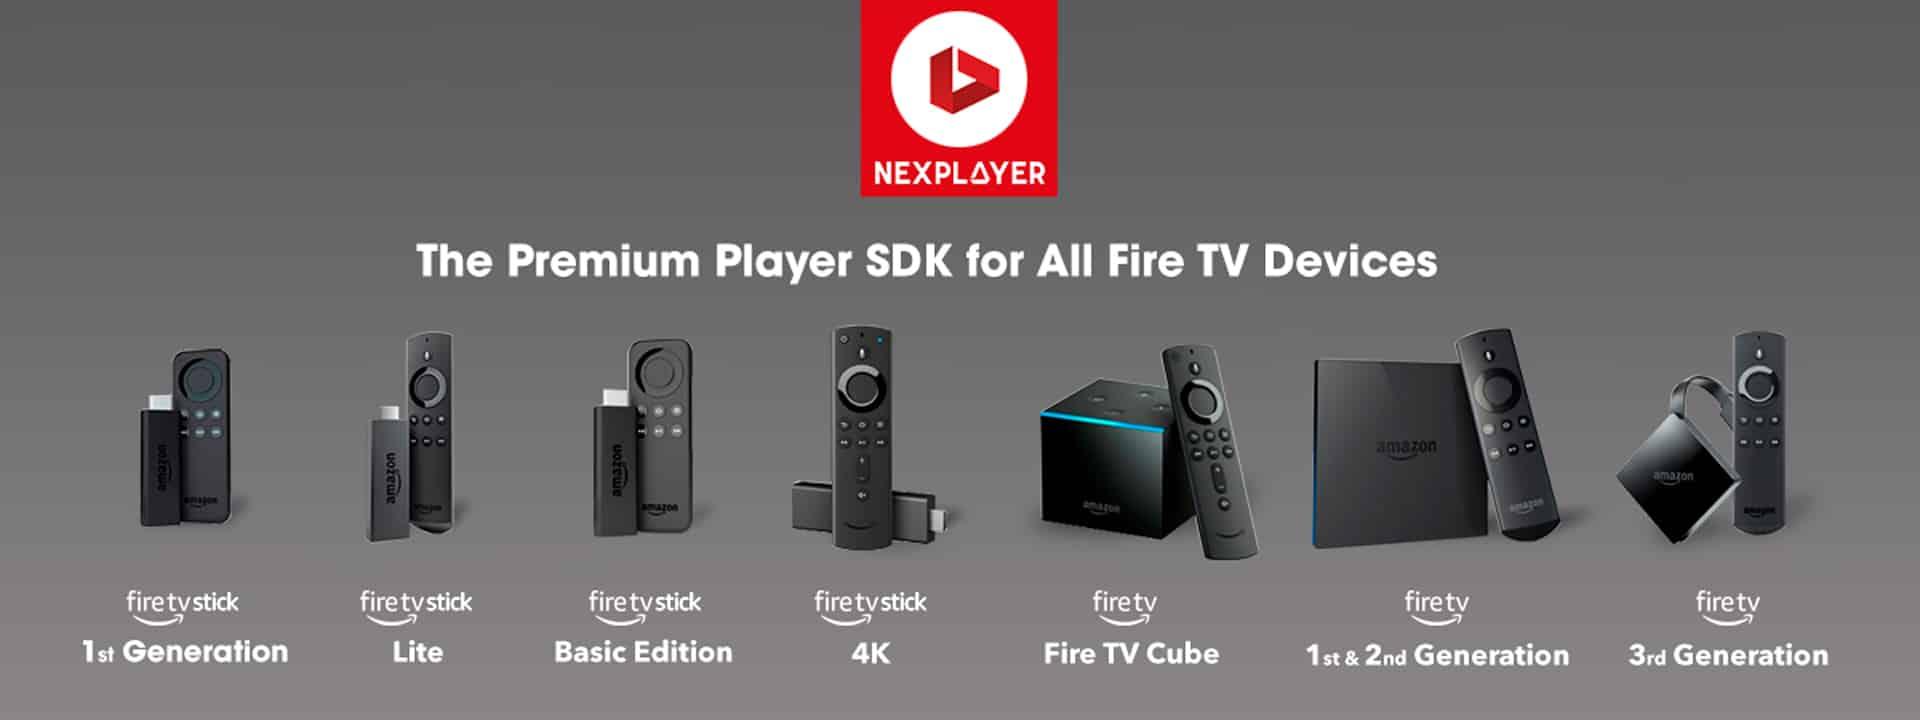 FireTv Devices NexPlayer